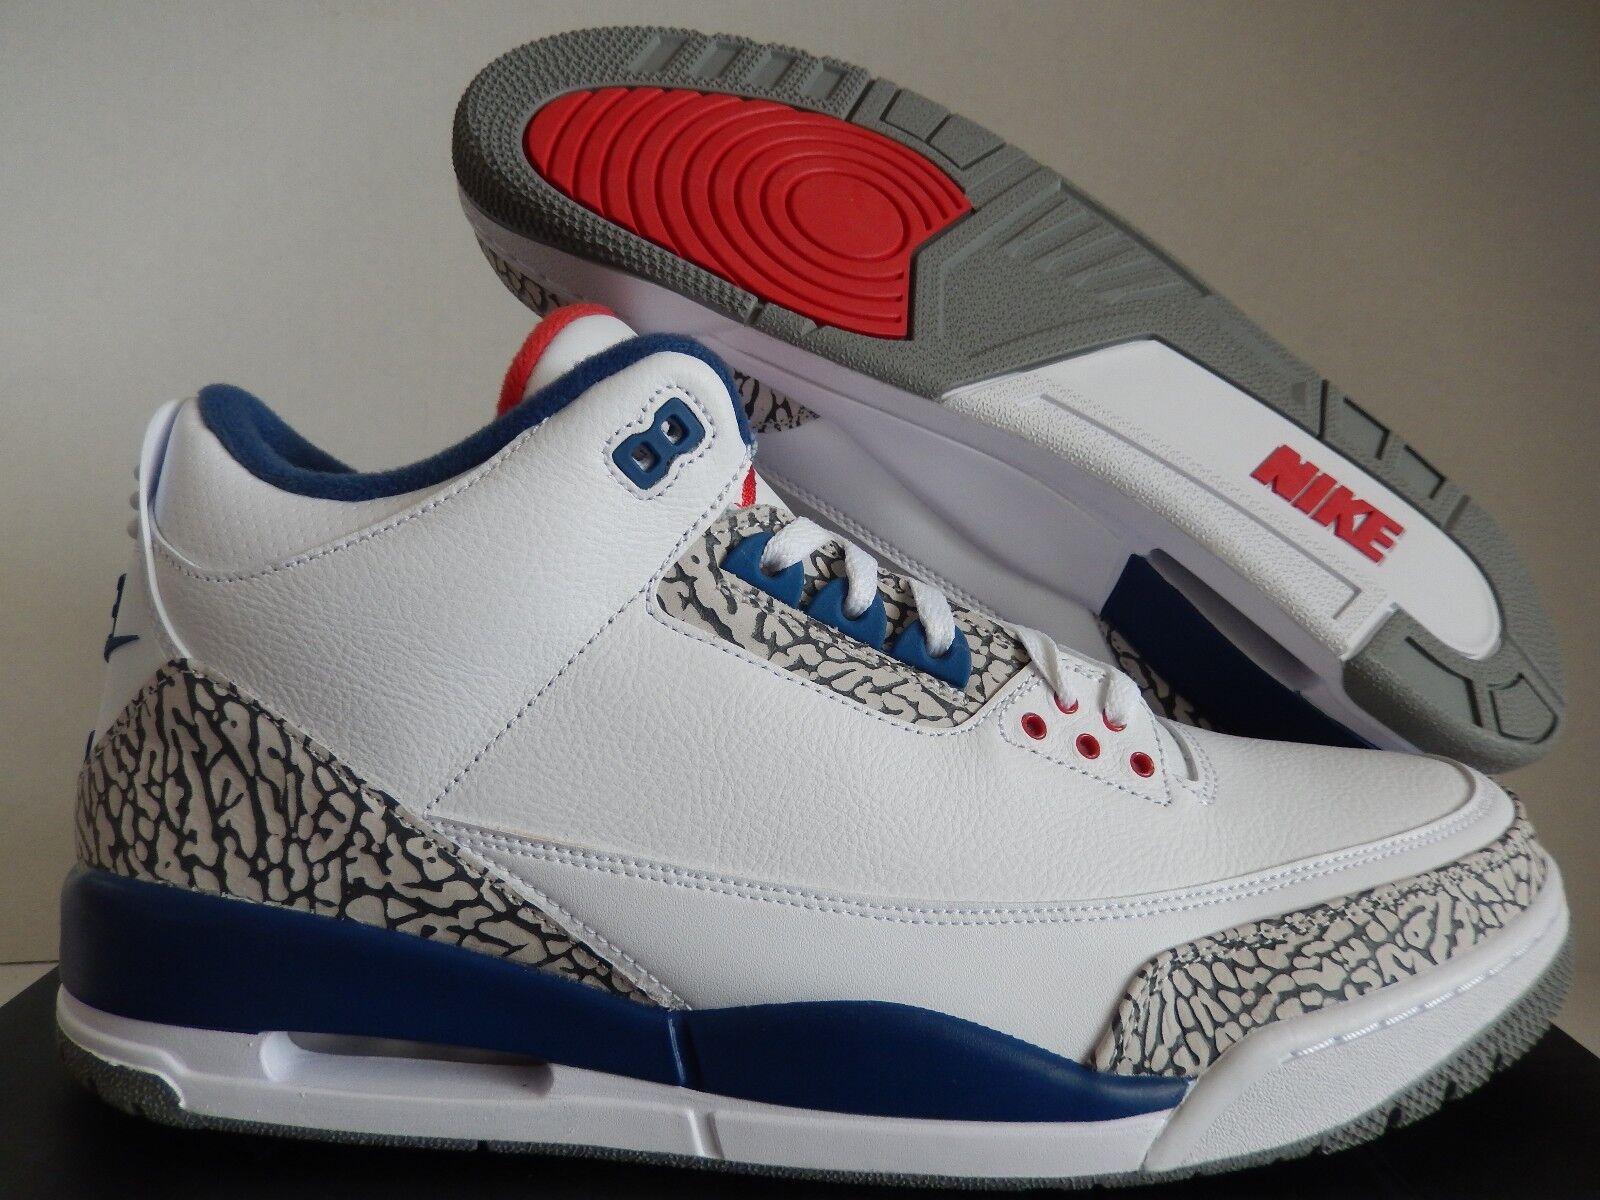 Nike Air Jordan 3 retro og Blanco-fire reducción estacional de red-true Azul Precio venta de estacional liquidacion 1d30e2